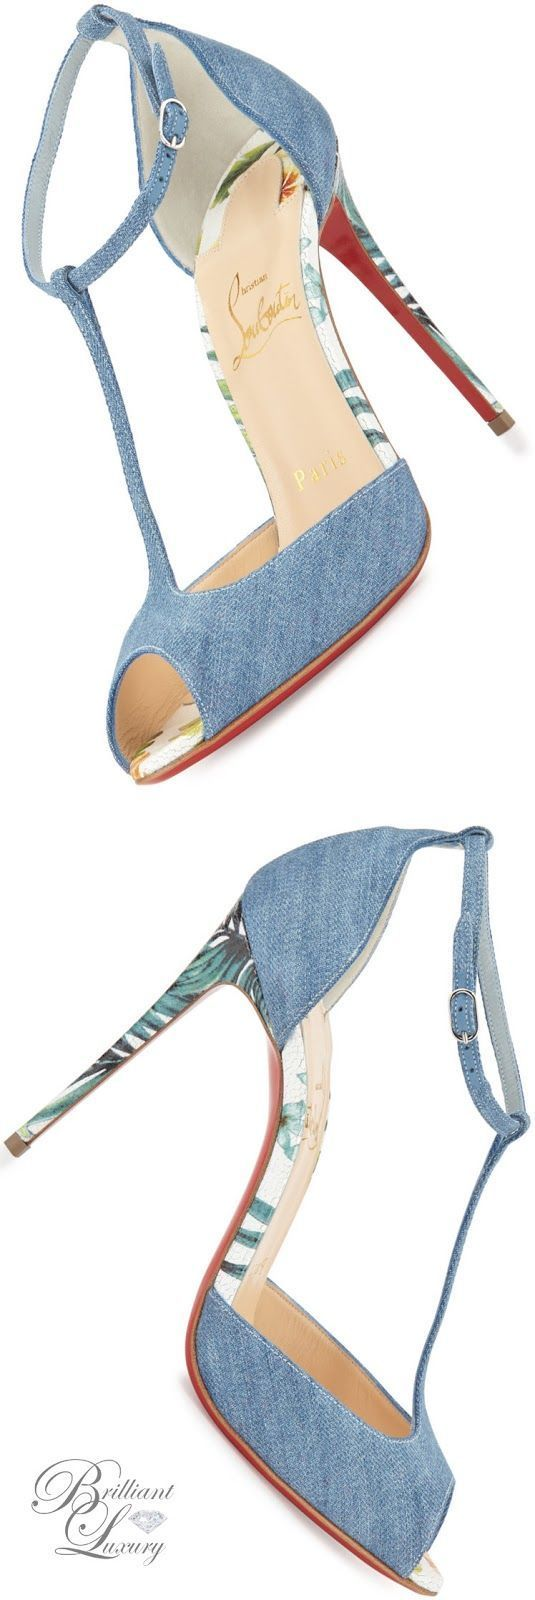 Hochzeit - L ~ High Heels ~ Classic Look